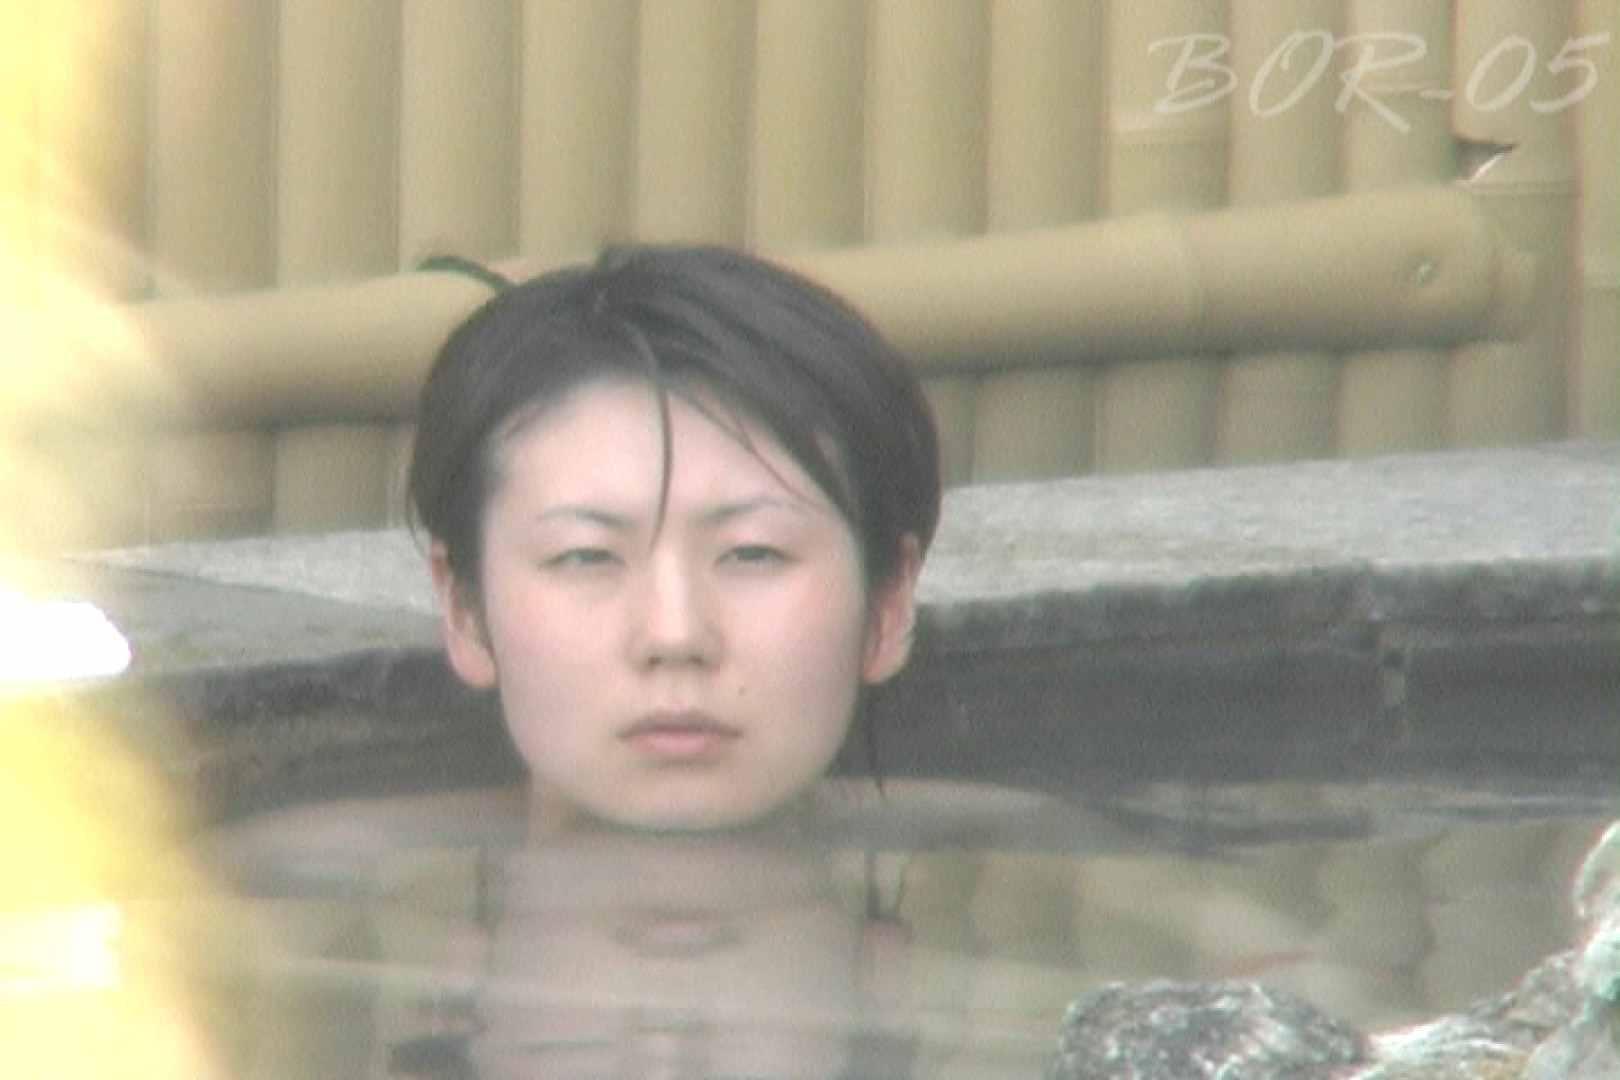 Aquaな露天風呂Vol.493 盗撮 AV無料動画キャプチャ 67PICs 20